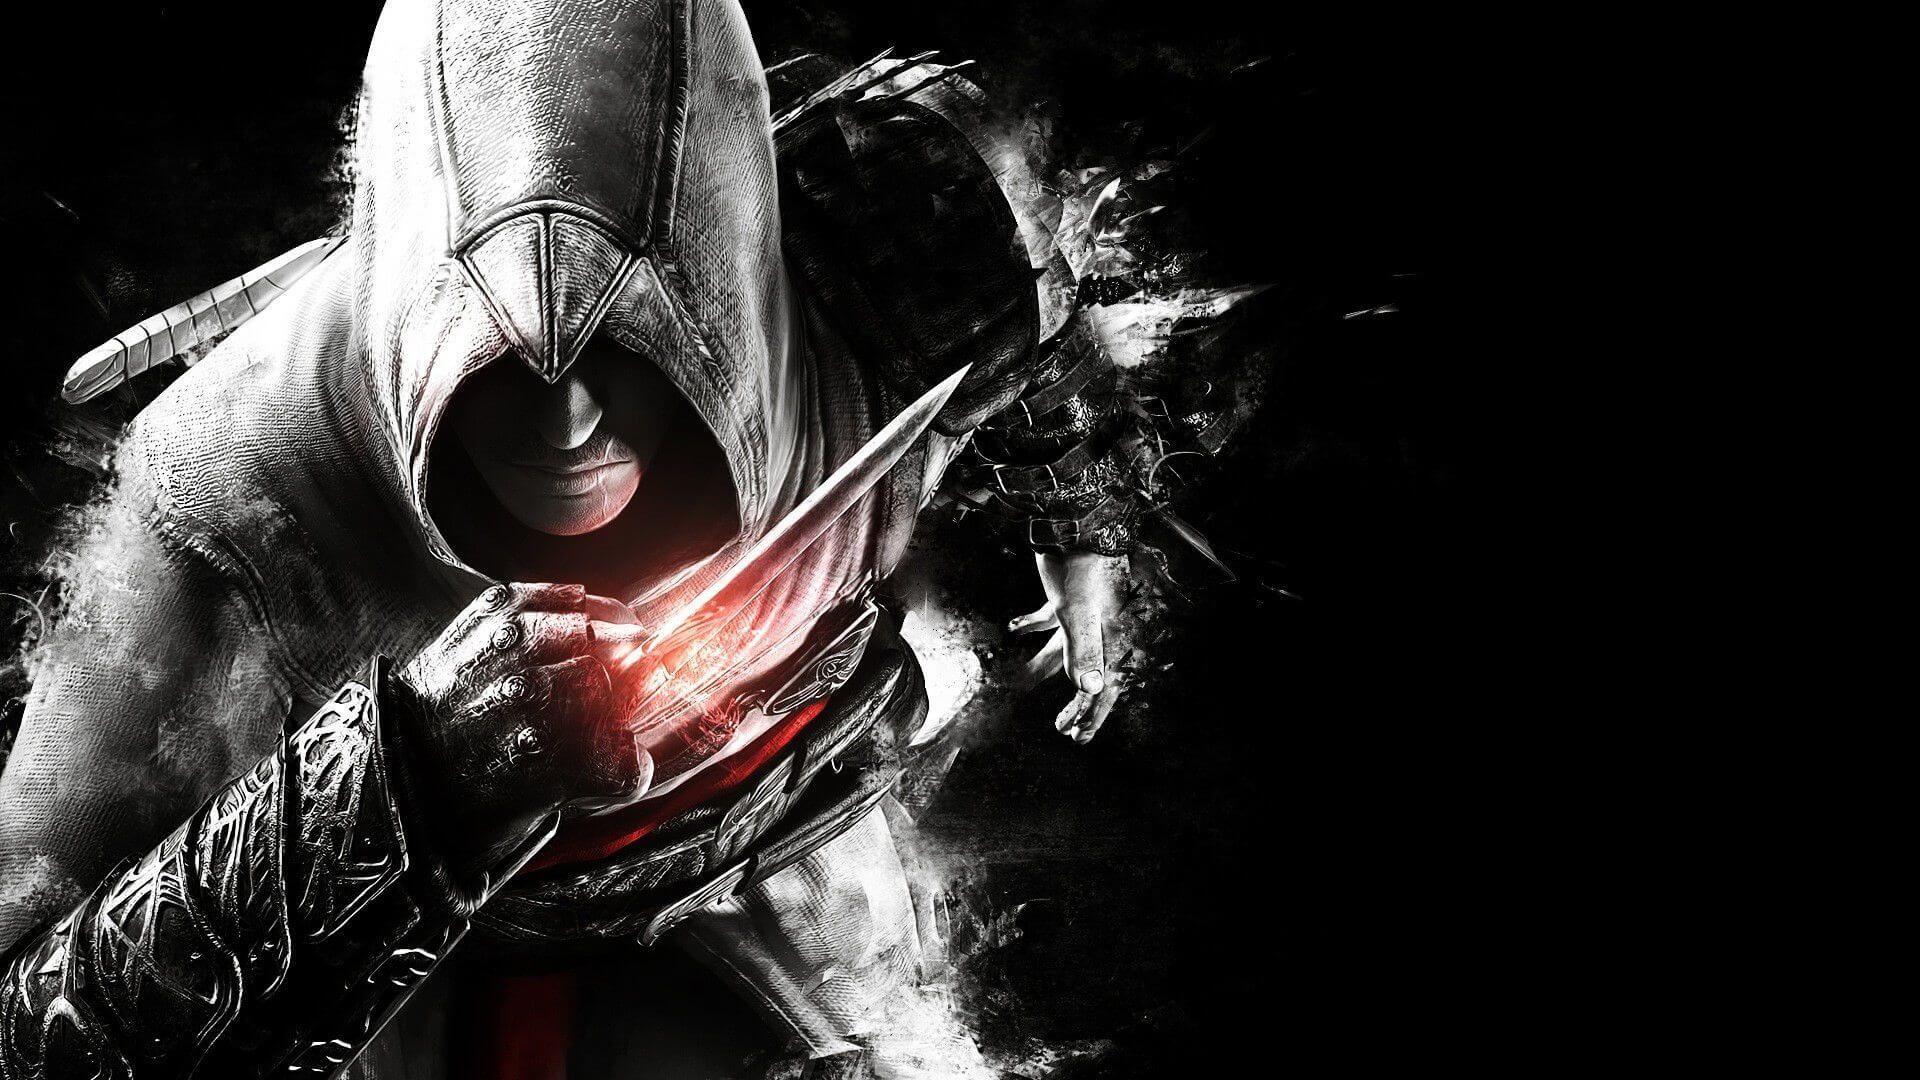 Обои и картинки Assassins creed на рабочий стол - подборка 10